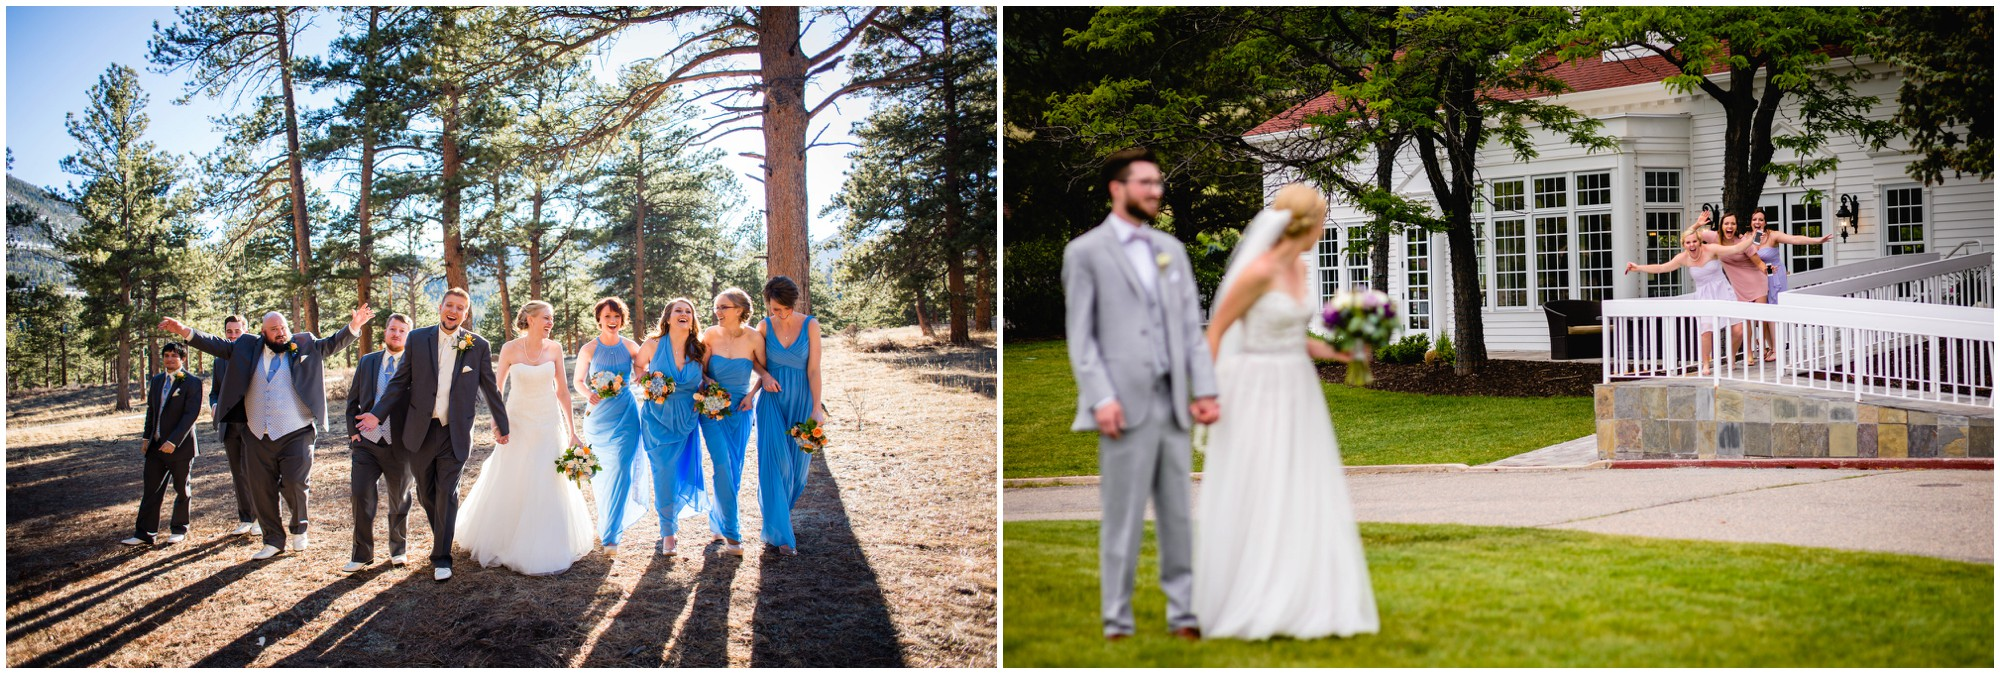 689-Della-terra-estes-park-wedding-Dolezal.jpg